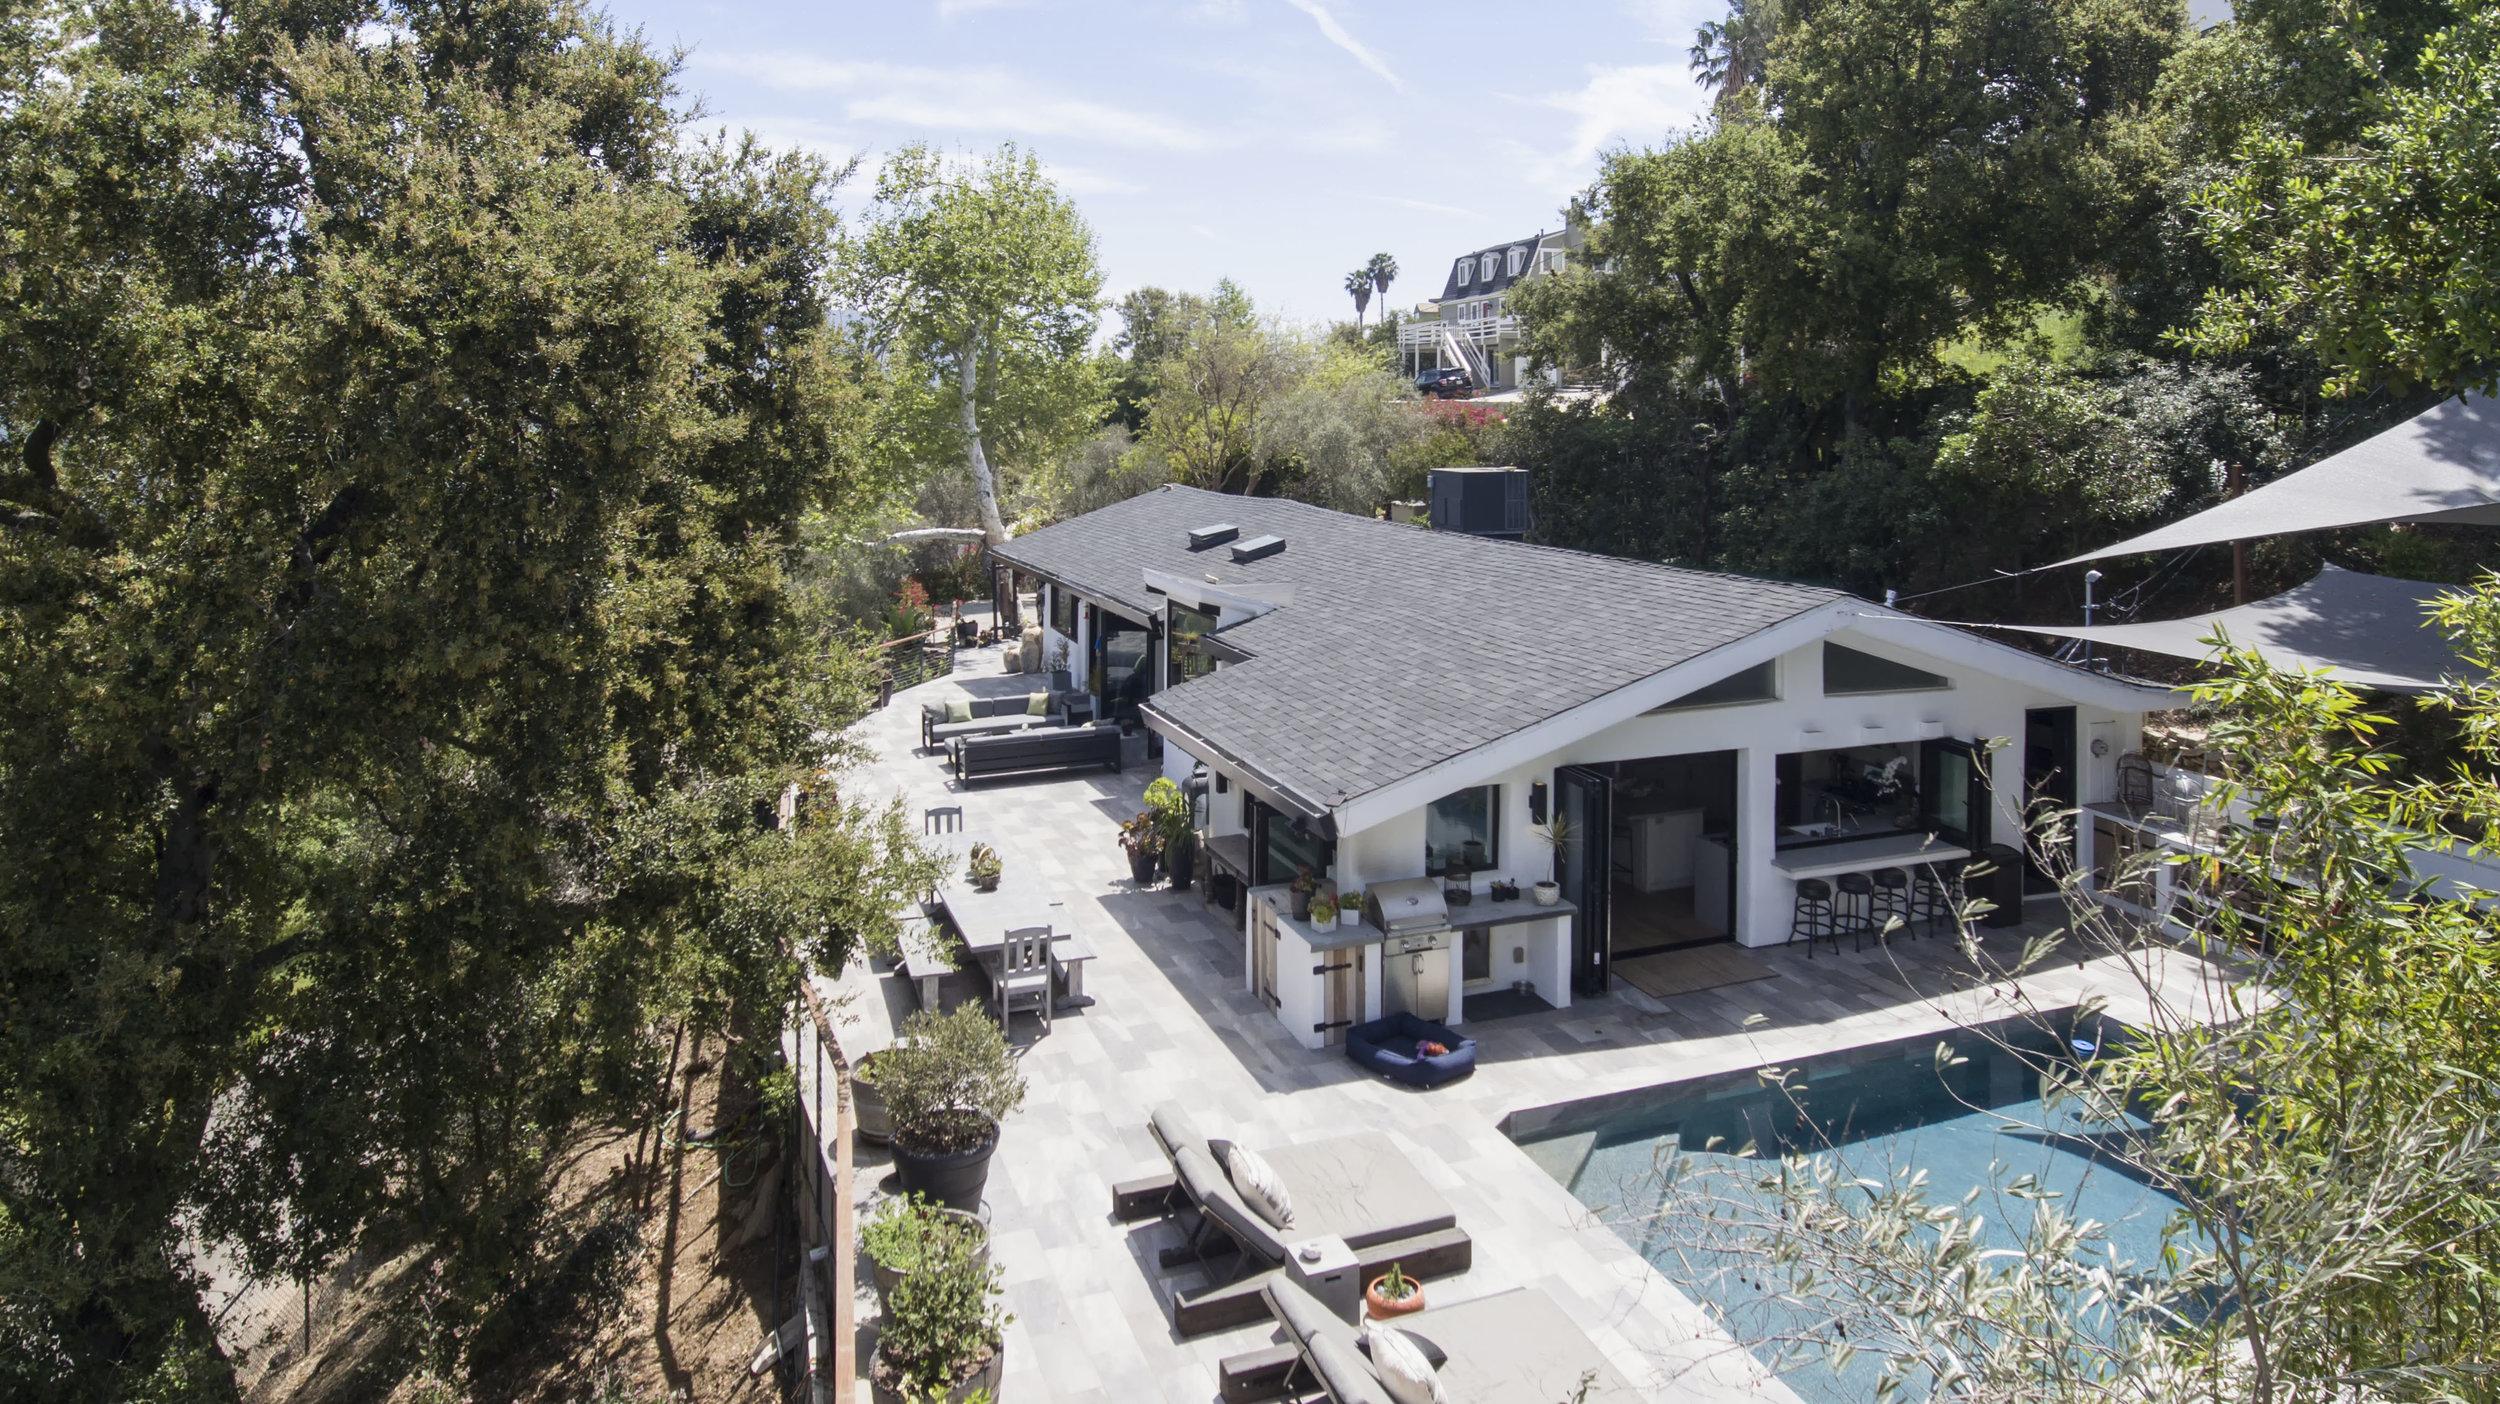 003 Aerial 26272 Cool Glen Way Malibu For Sale Luxury Real Estate.jpg